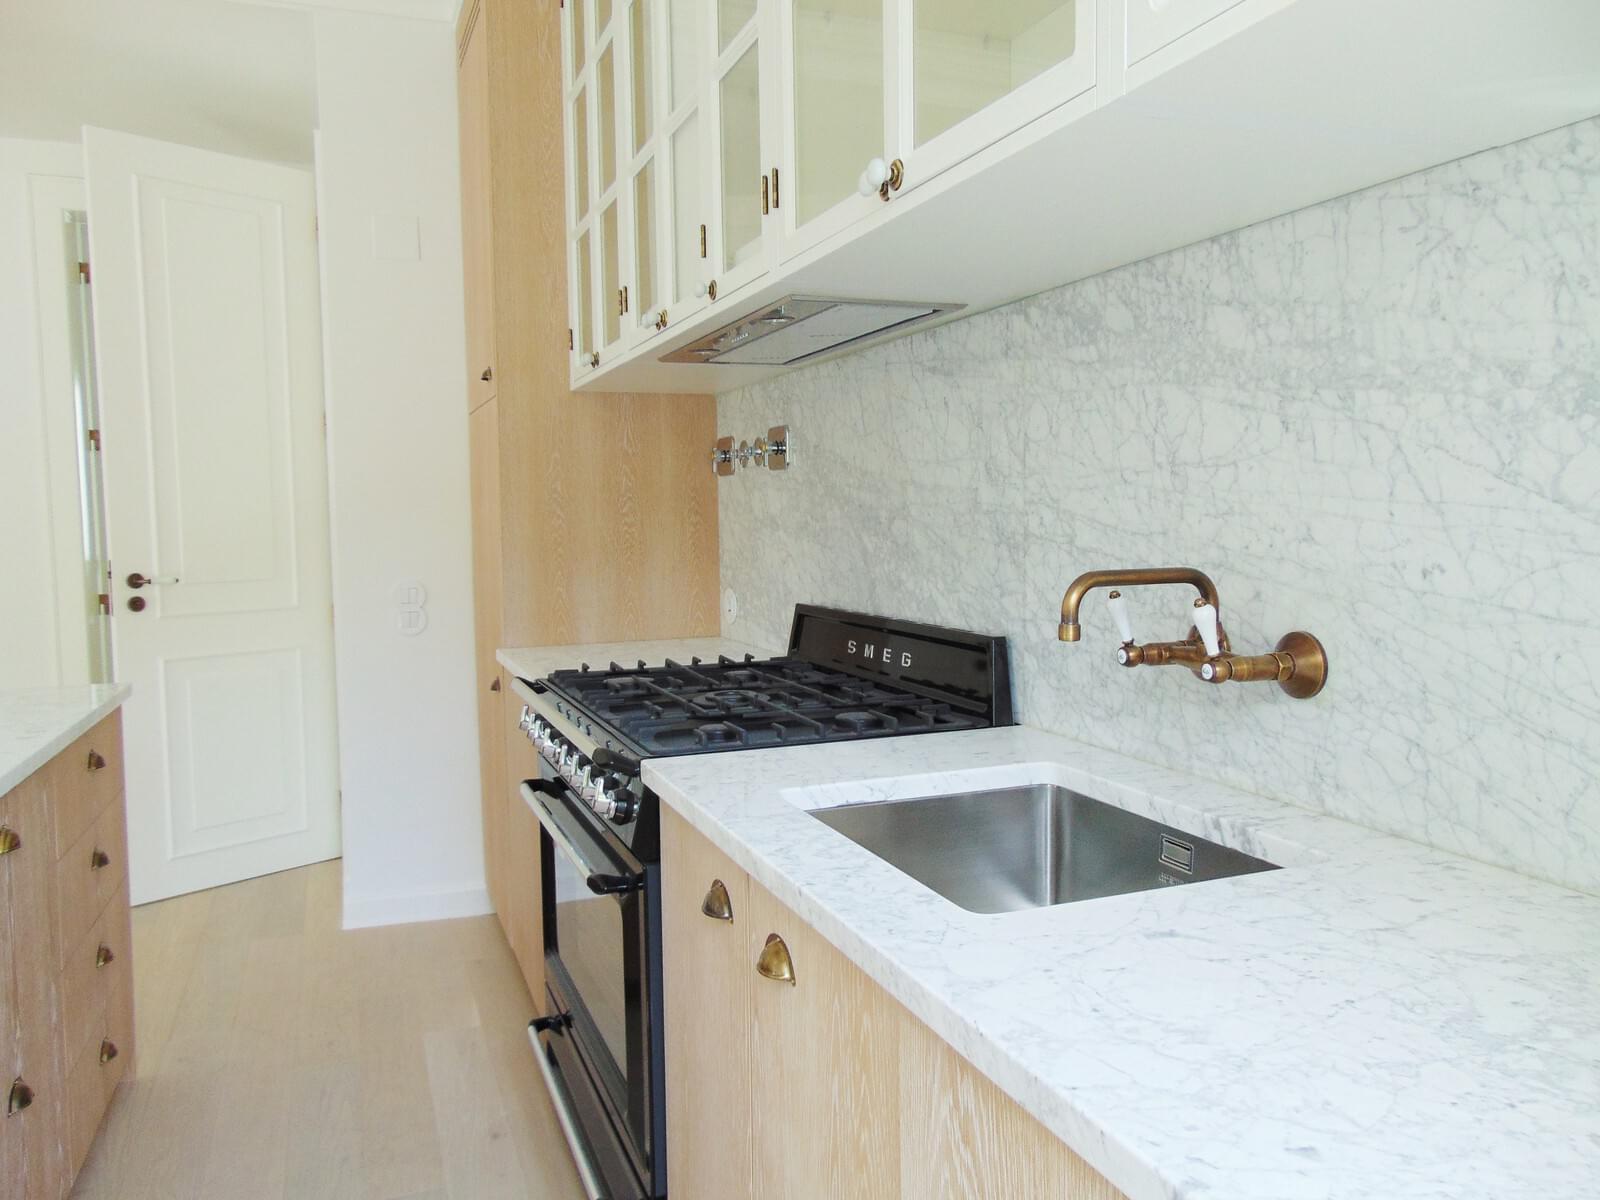 pf18152-apartamento-t2-lisboa-0dcafd2b-123c-437b-845d-dbfce3a82092